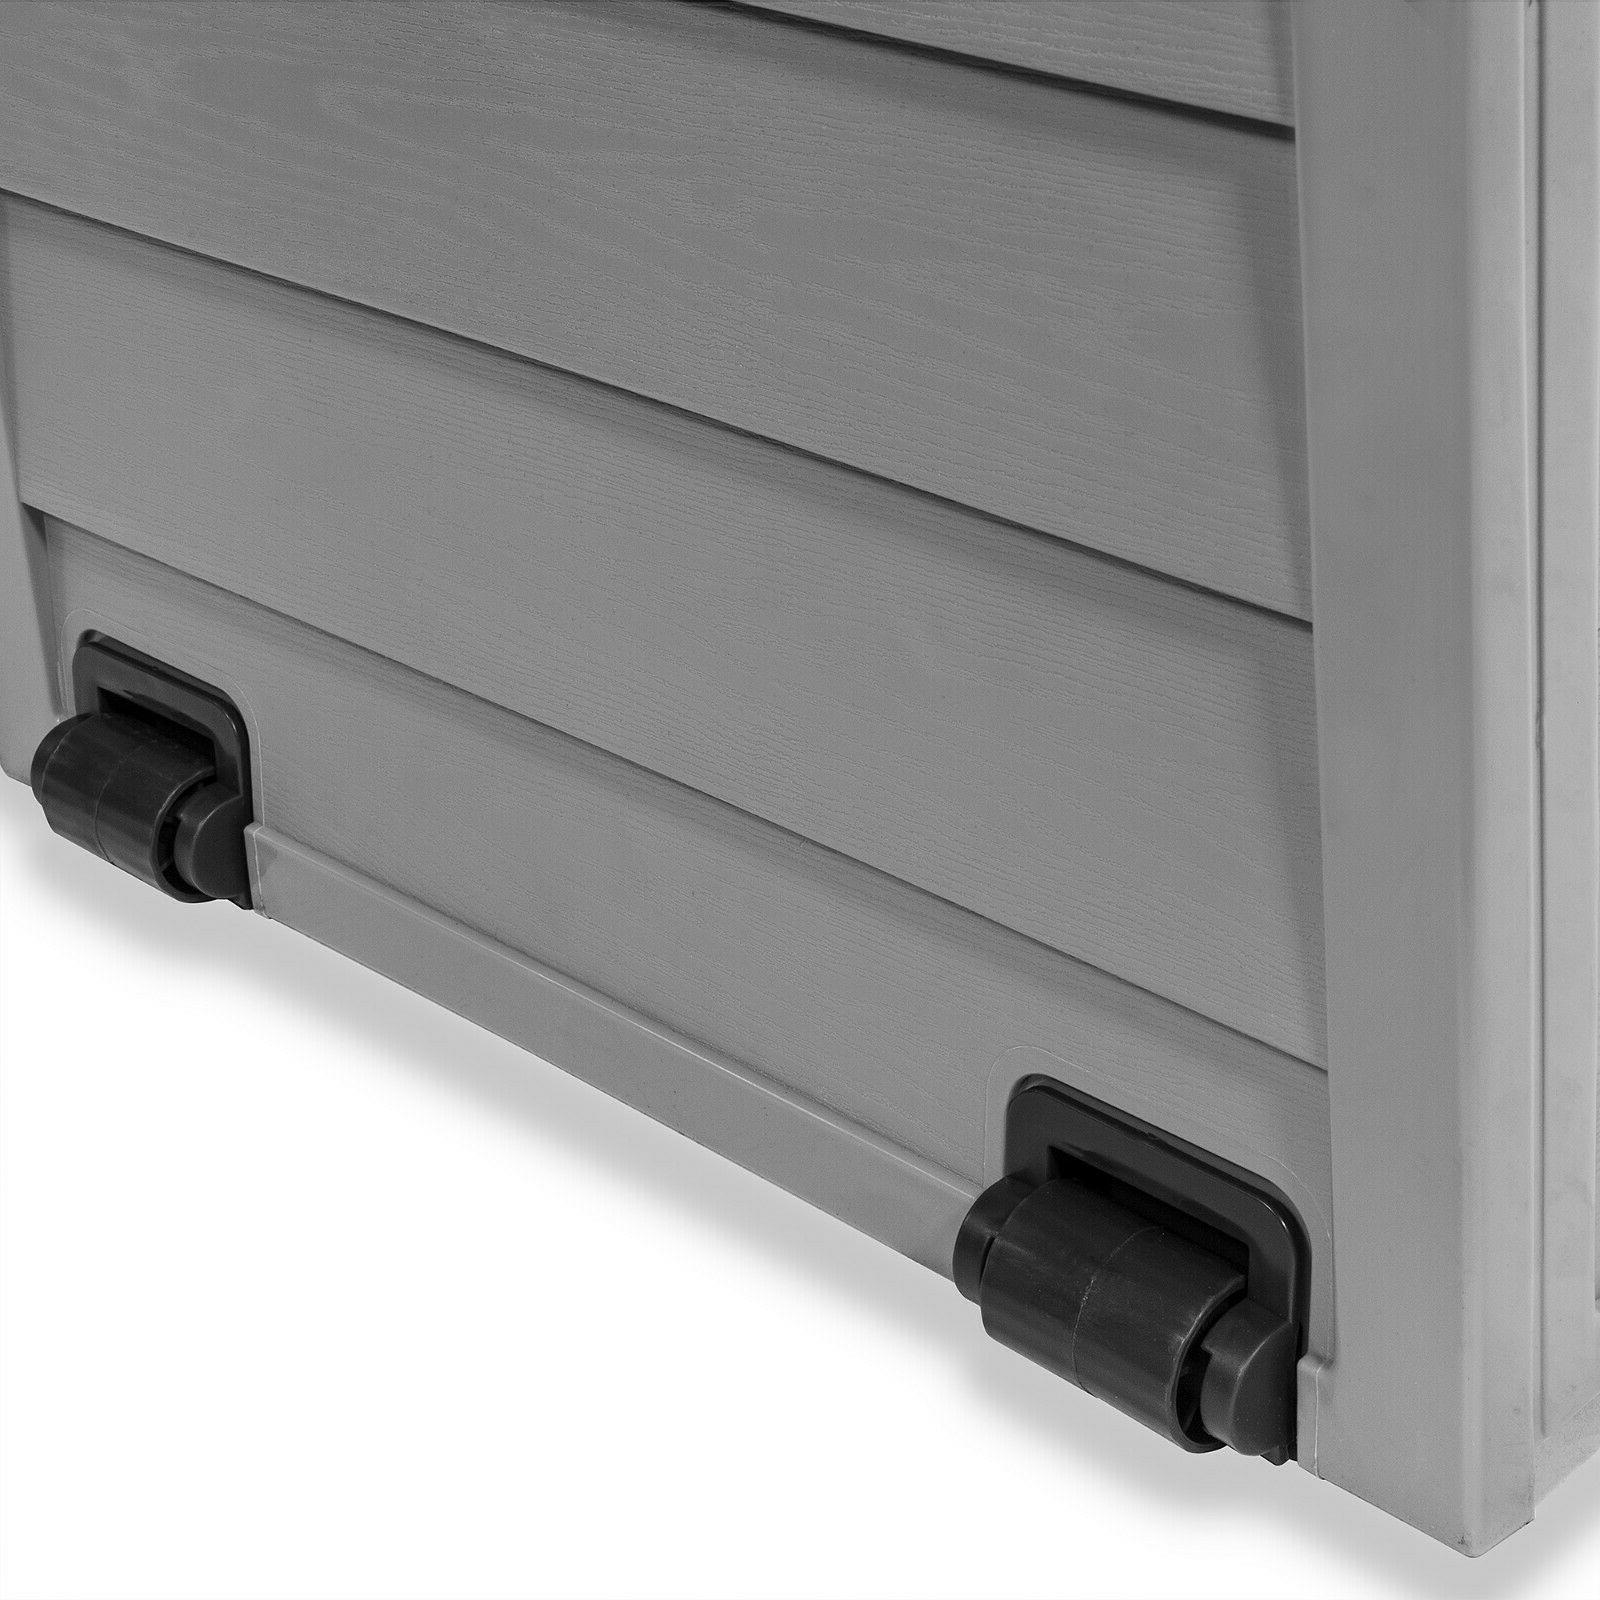 All-Weather Deck Box w/ Pool Shed Backyard 63